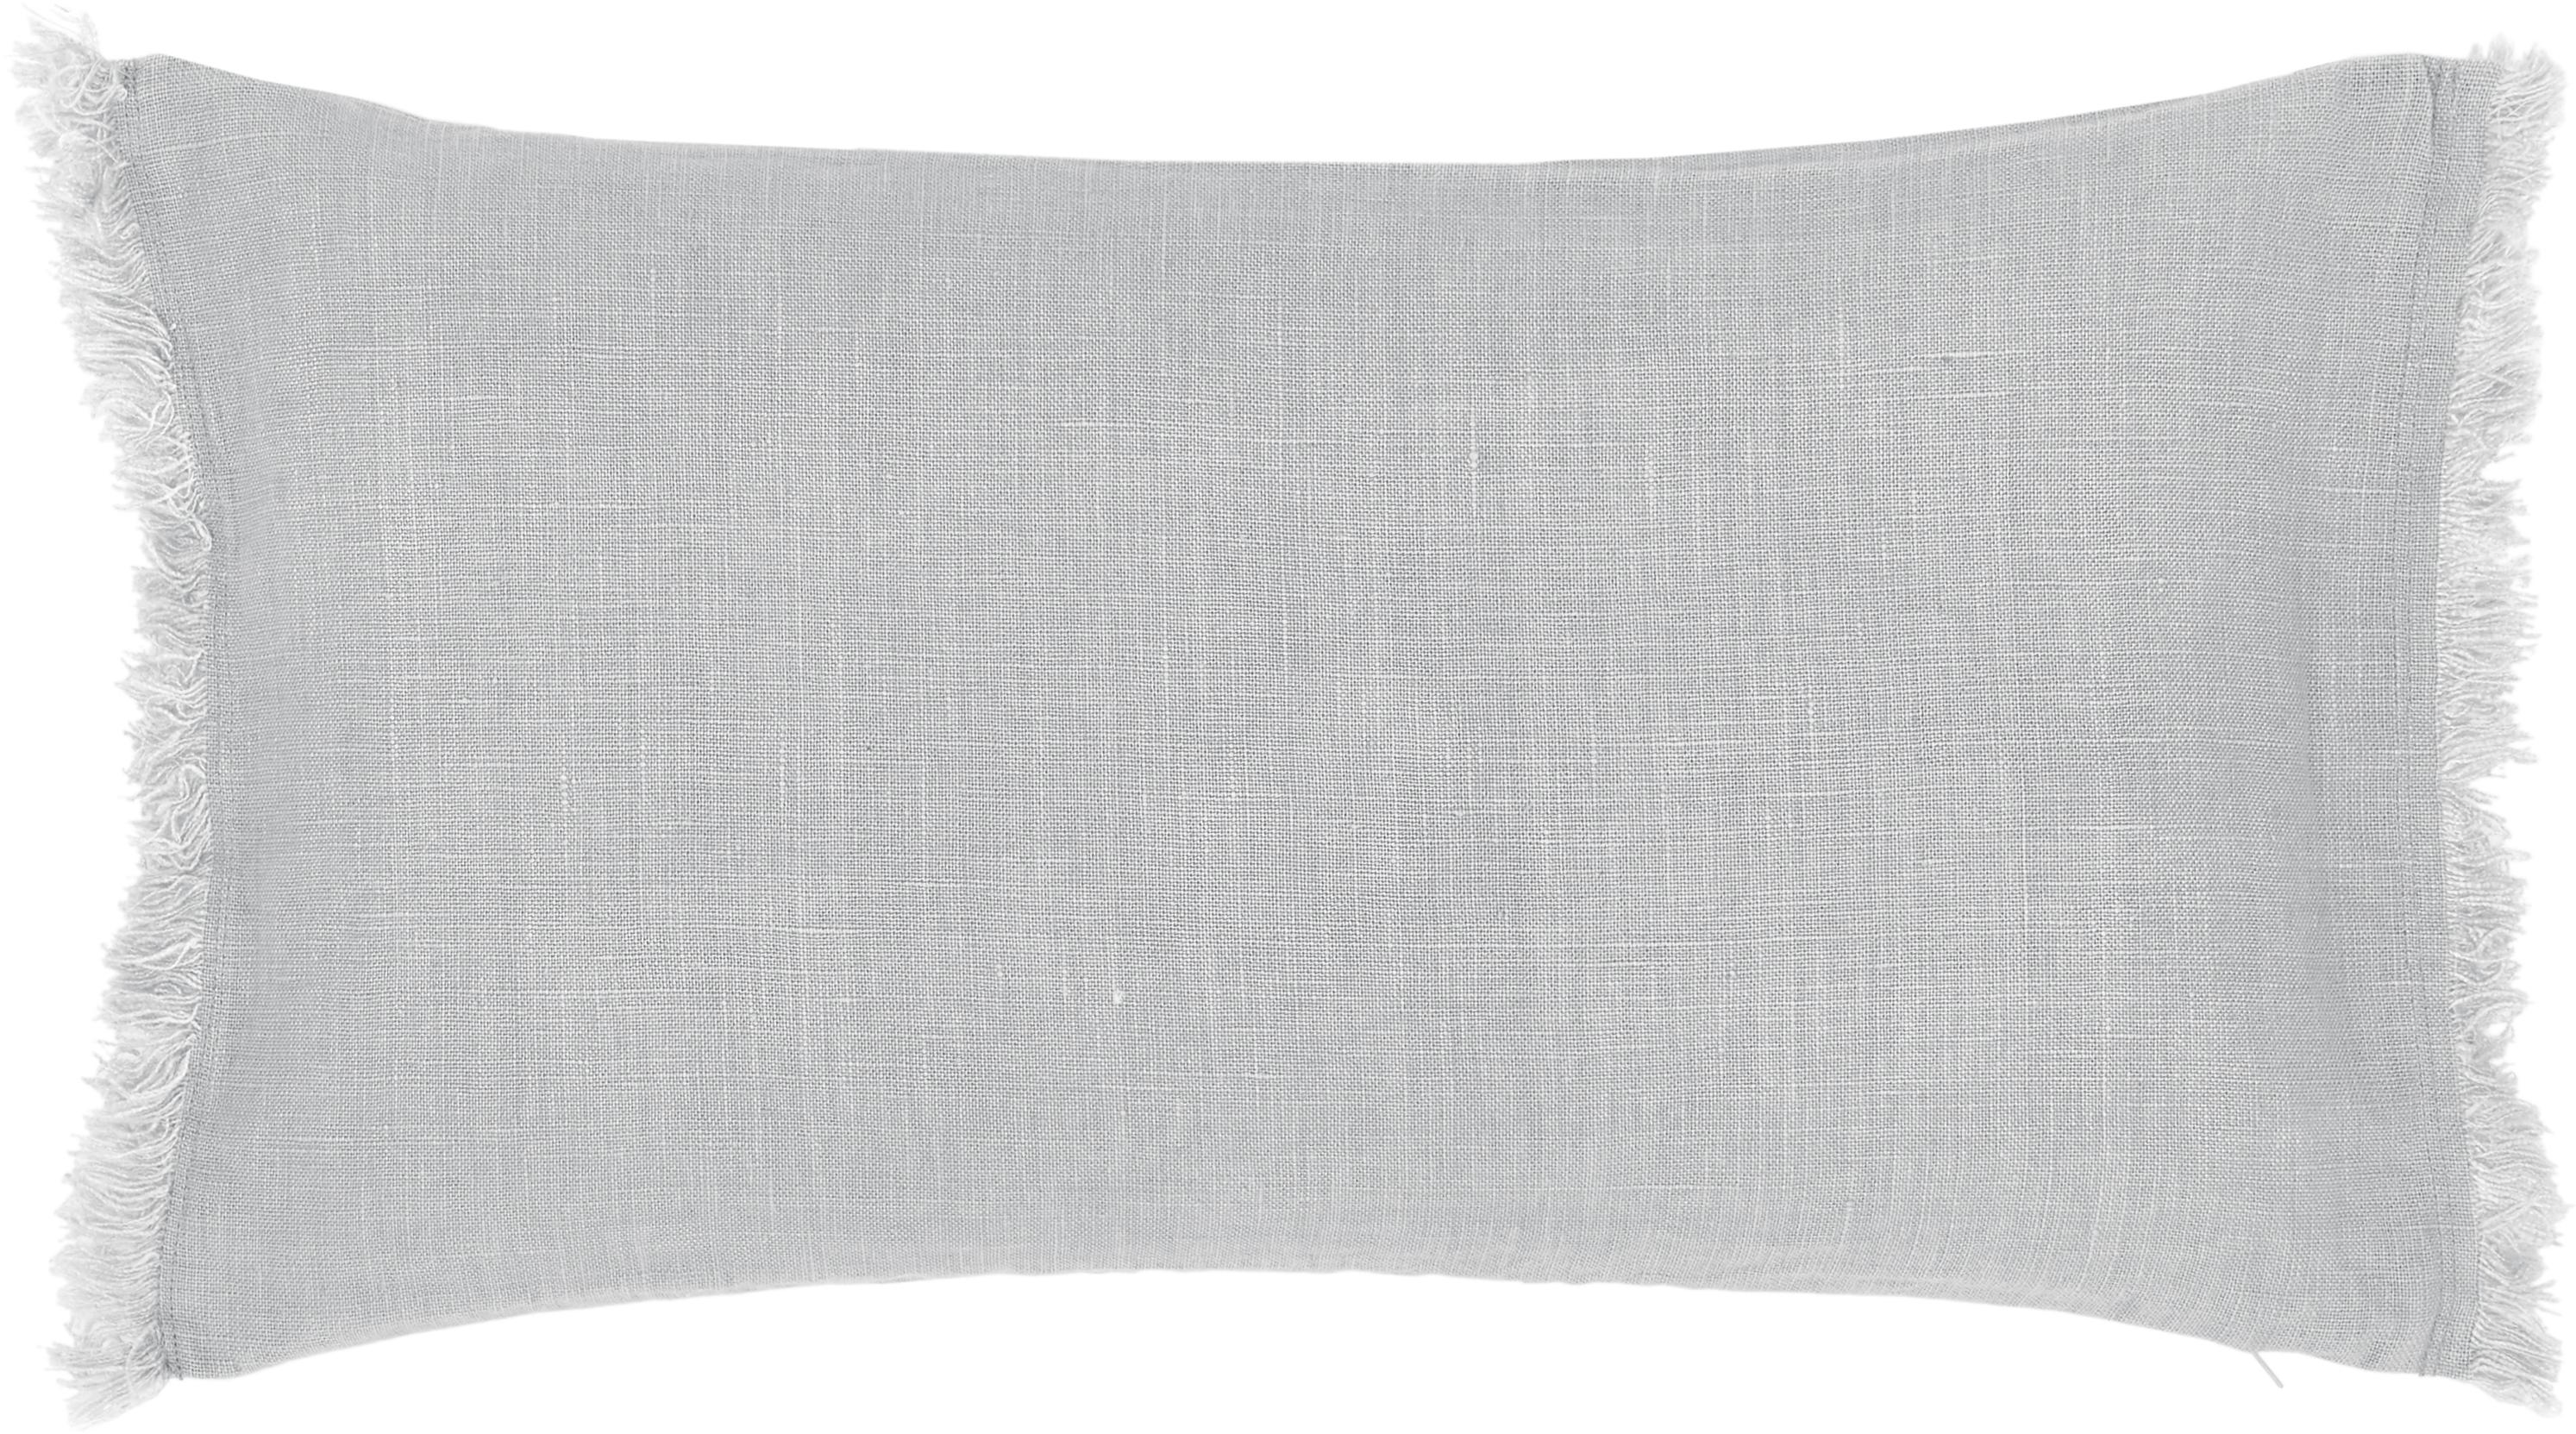 Funda de cojín de lino con flecos Luana, 100%lino, Gris claro, An 30 x L 50 cm